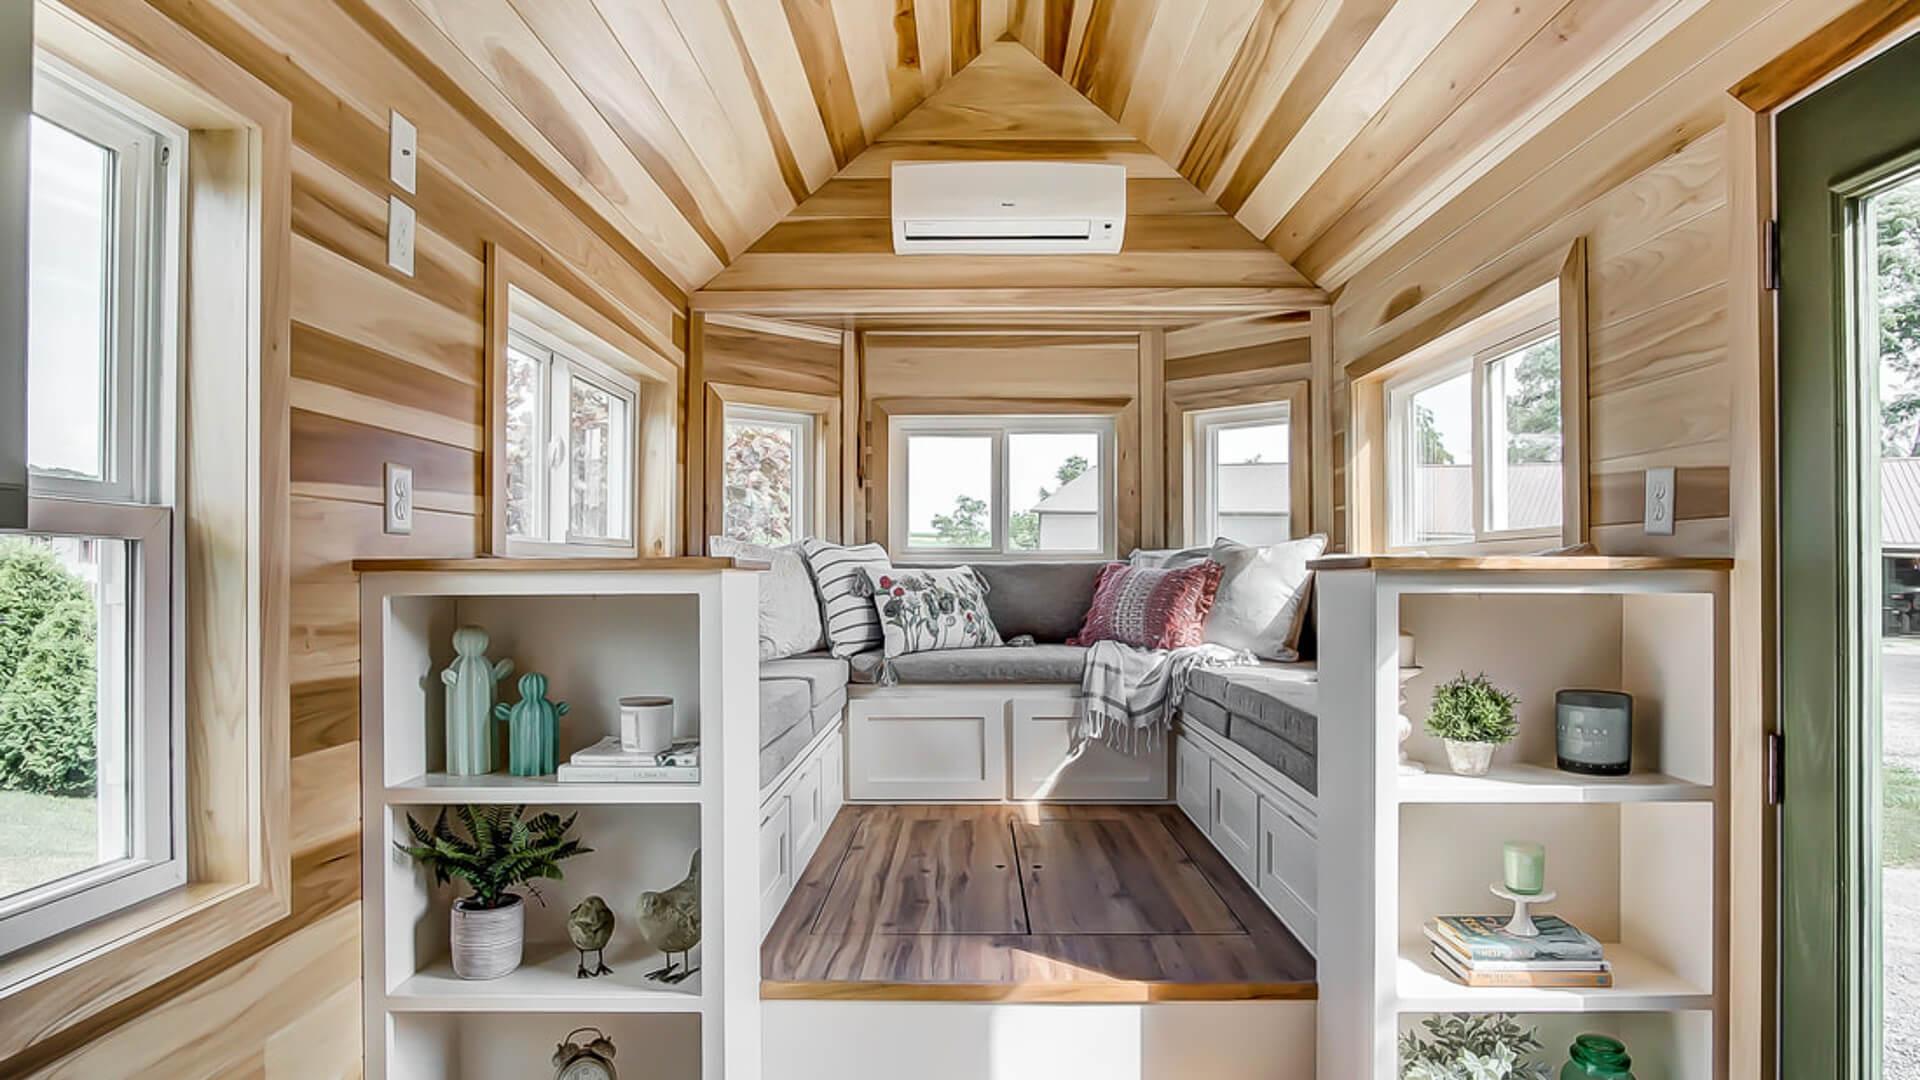 Get a Glimpse Inside 10 Tiny Homes